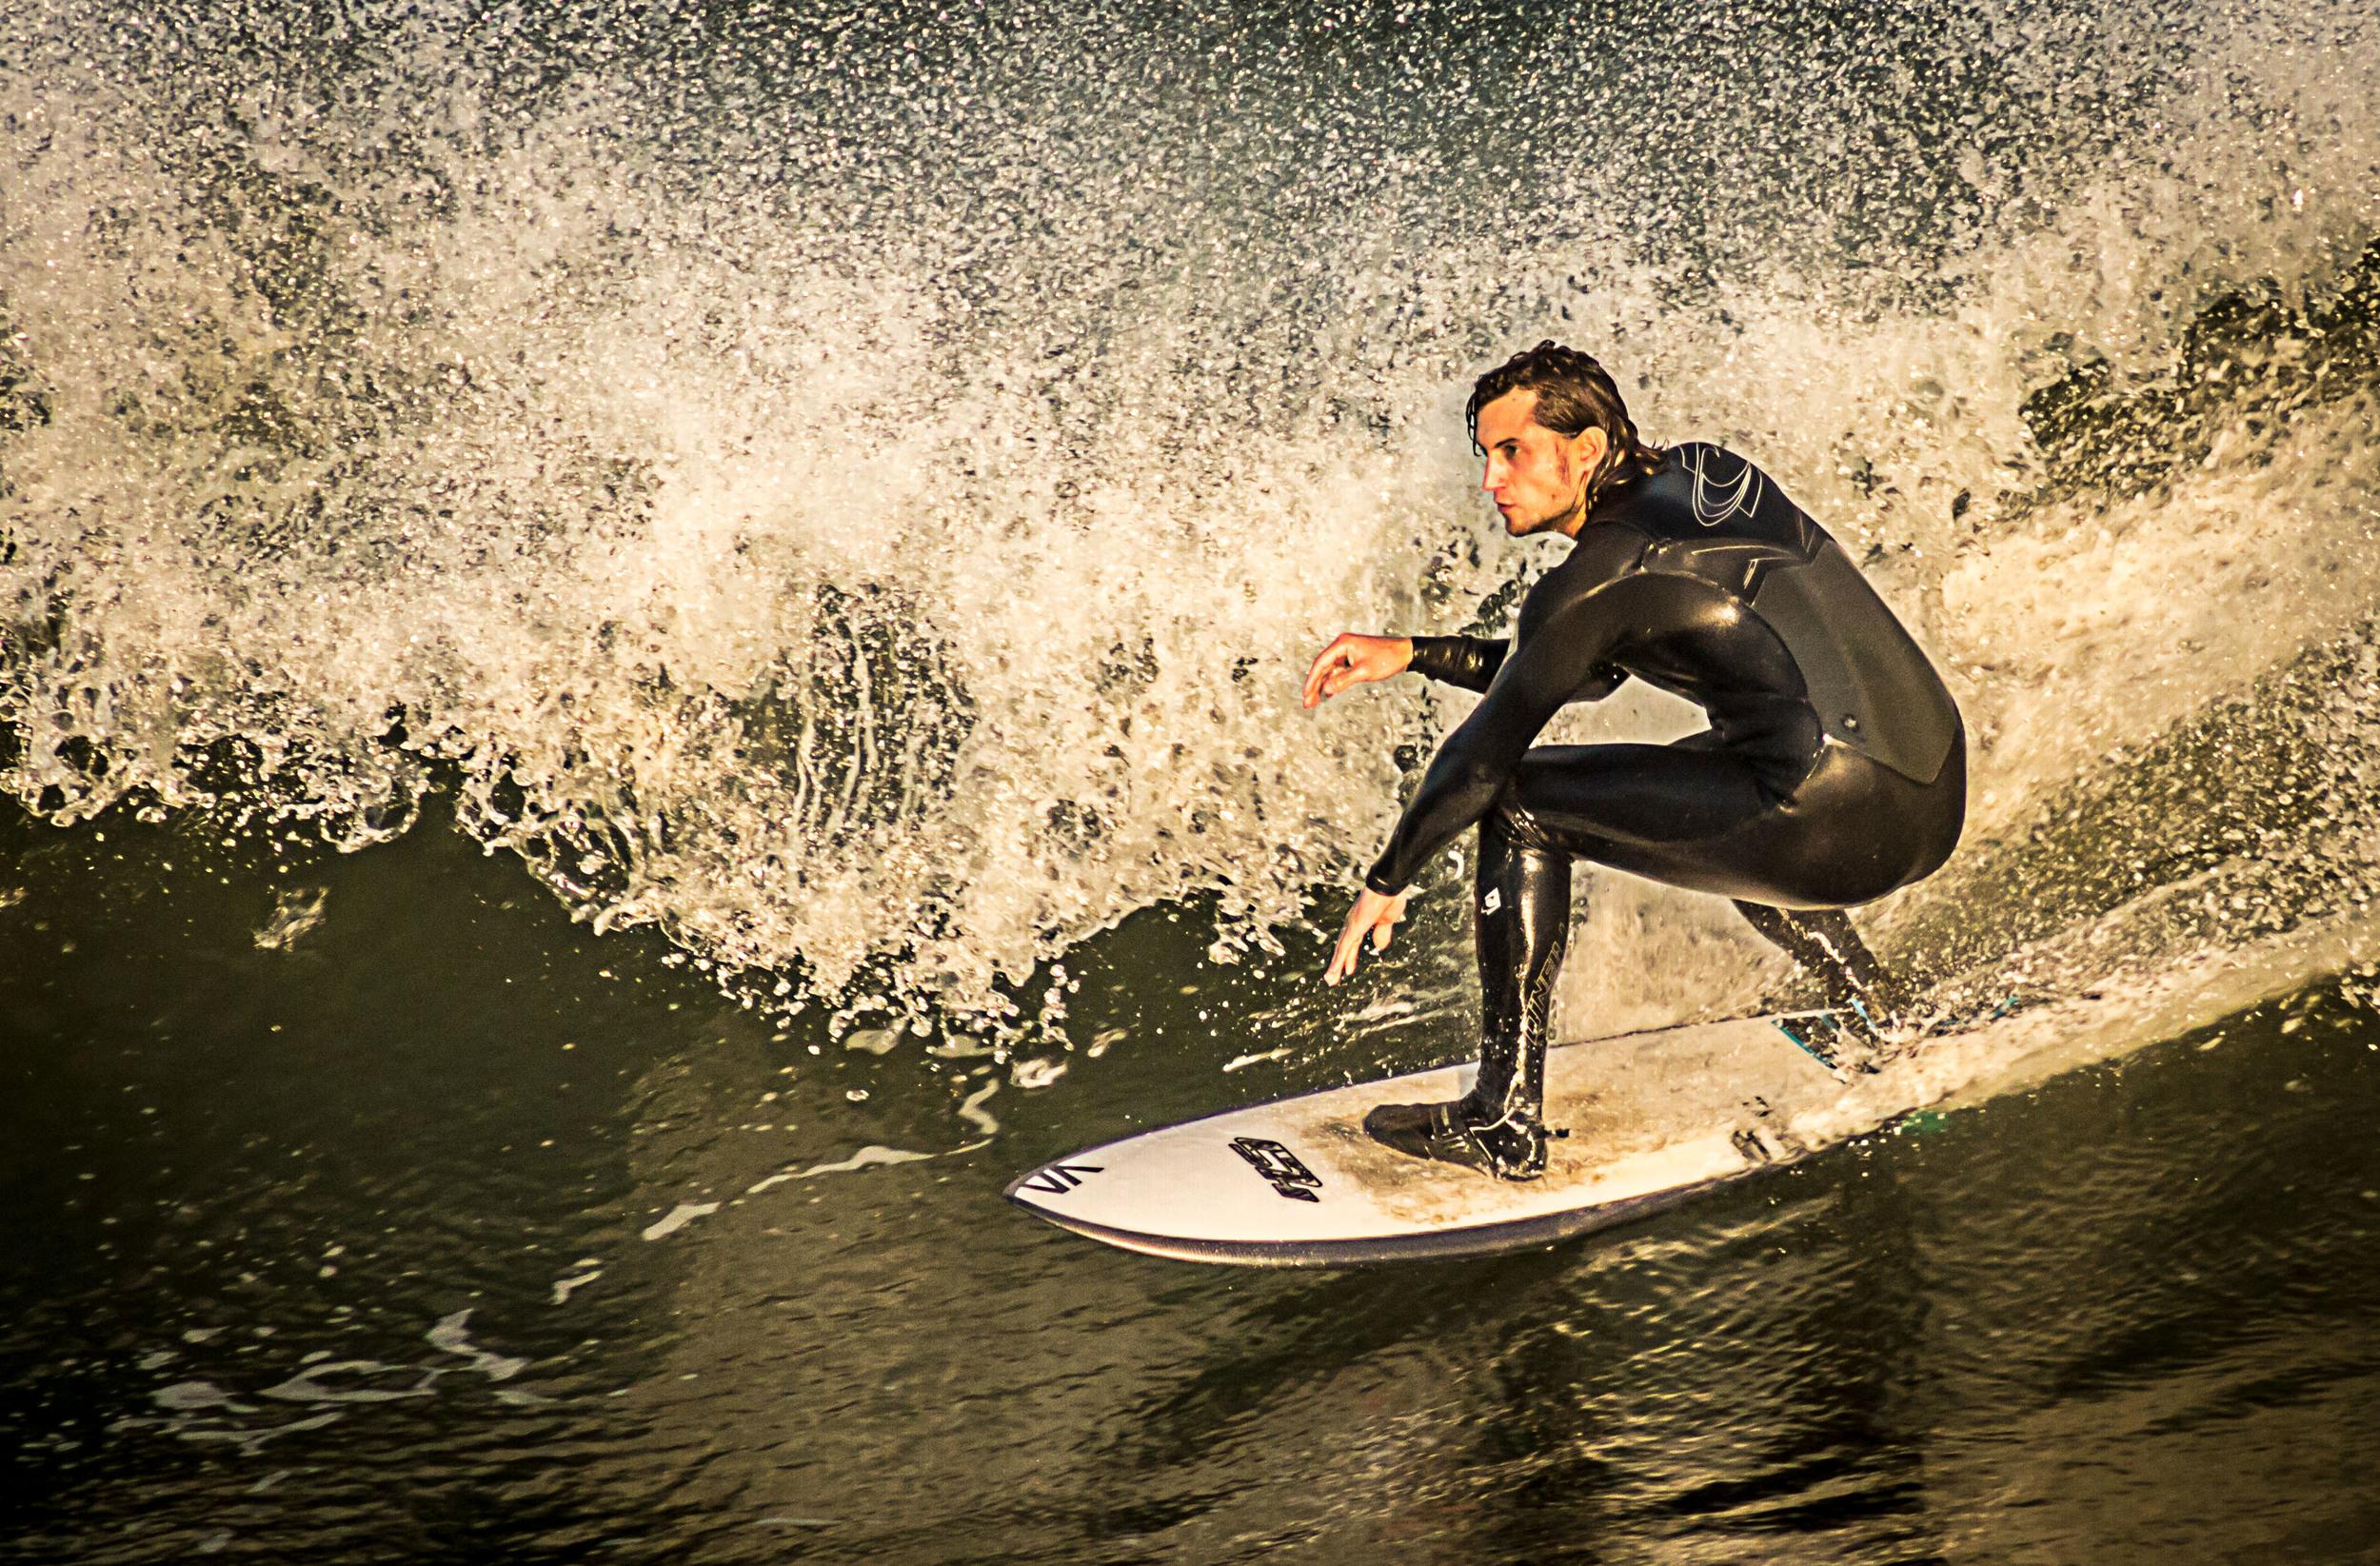 Shredding the wave